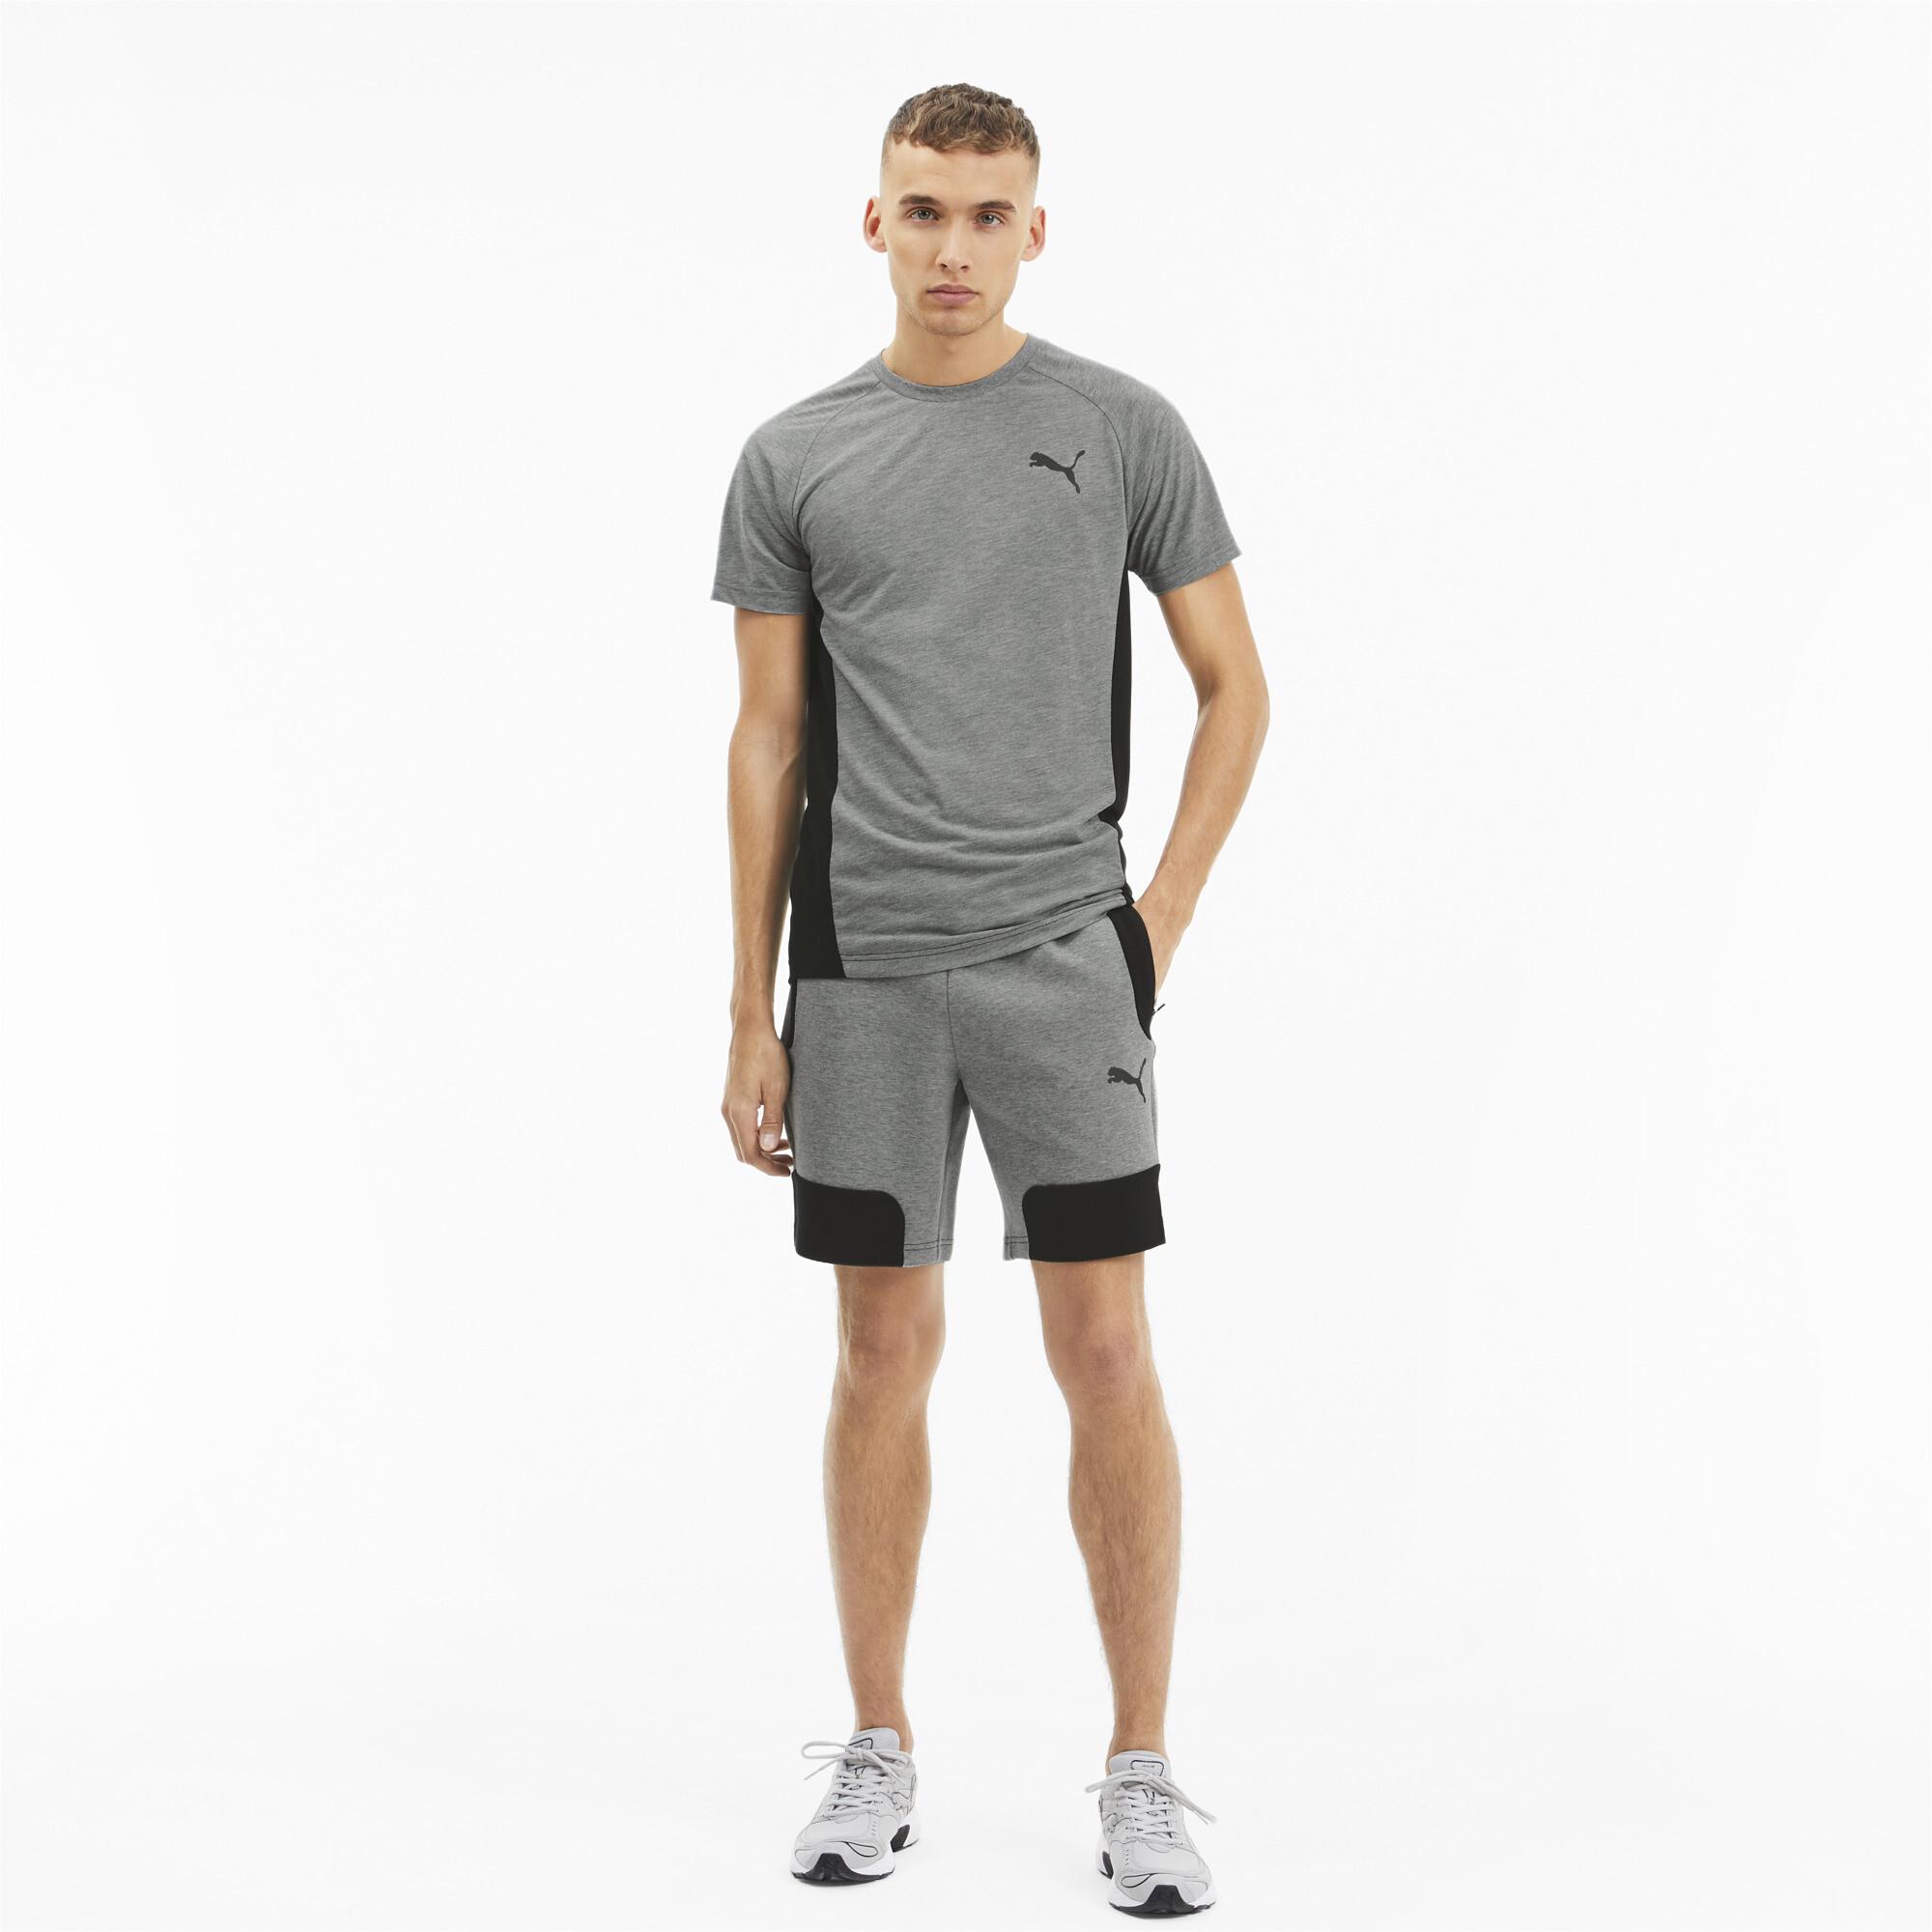 PUMA-Evostripe-Men-039-s-Shorts-Men-Knitted-Shorts-Basics thumbnail 17